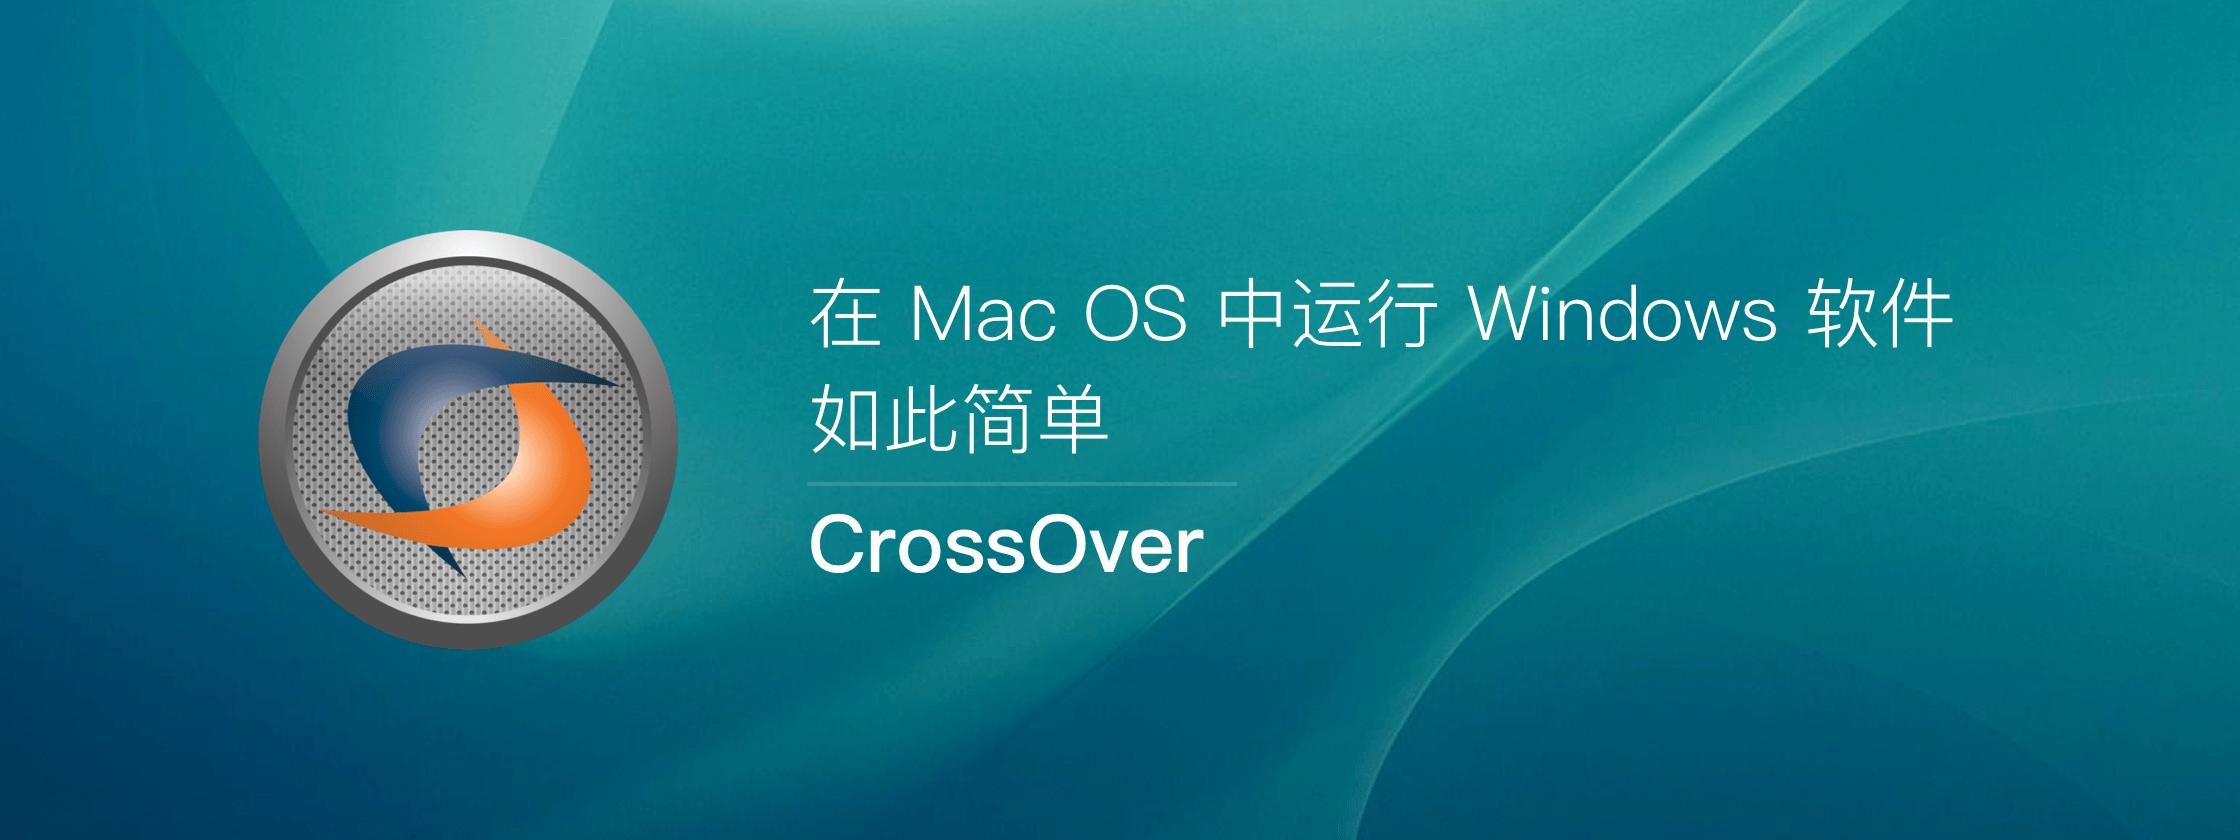 CrossOver for Mac – 在 Mac OS  中运行 Windows 软件,如此简单